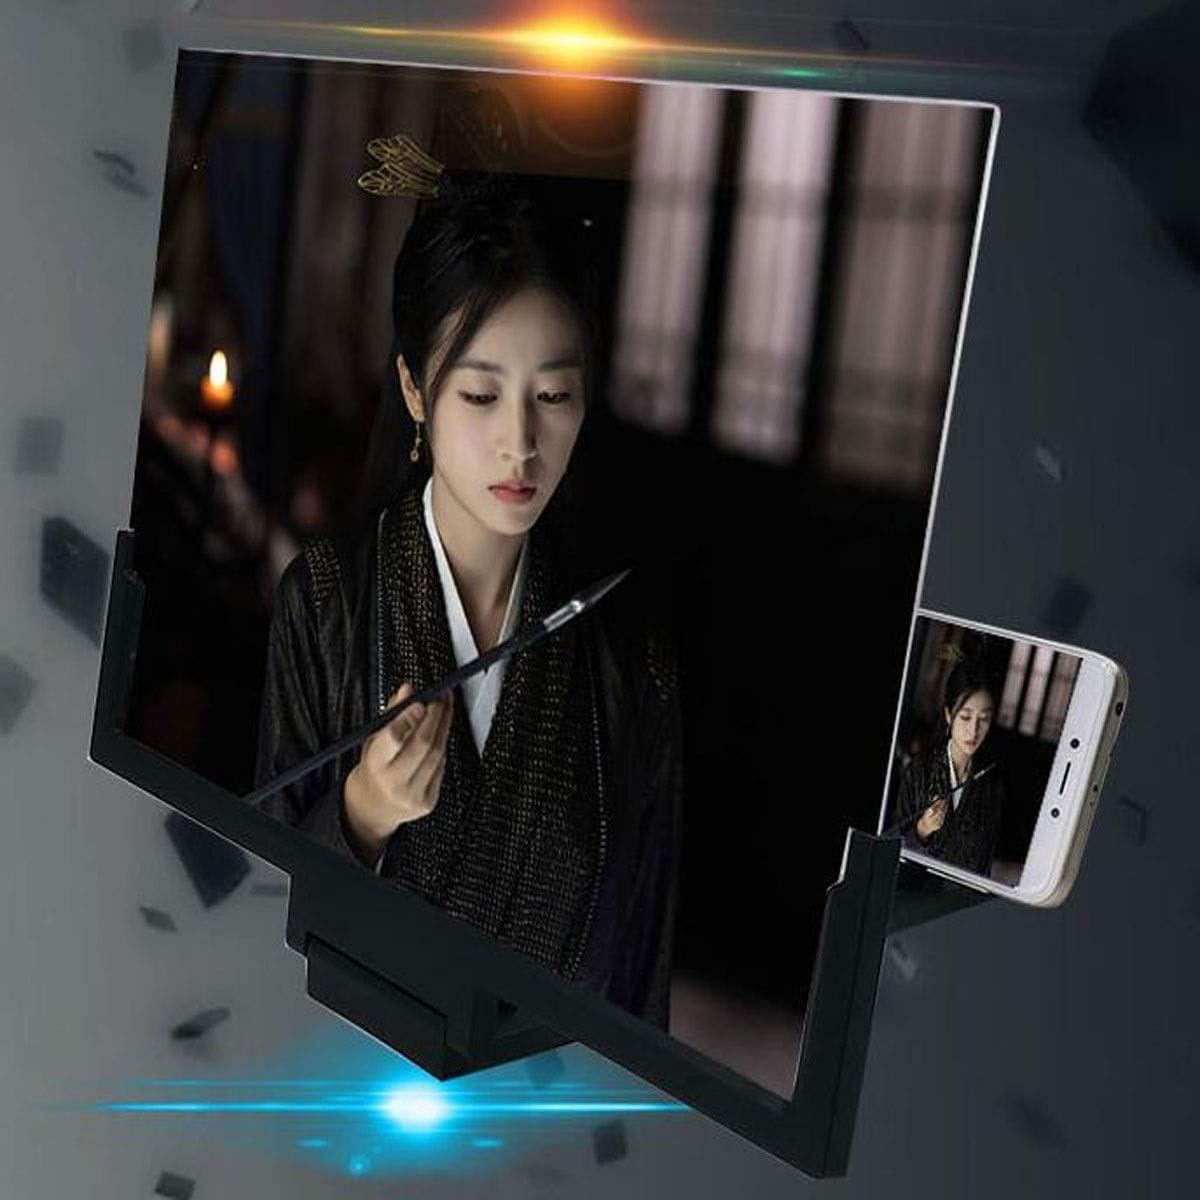 Qiyuezhuangshi Mobile Phone Screen Amplifier HD 14 Inch Full Screen Watching TV Drama Old Man Reading Newspaper Extended Mirror Desktop Bracket Smart Phone Universal Black,Beautiful